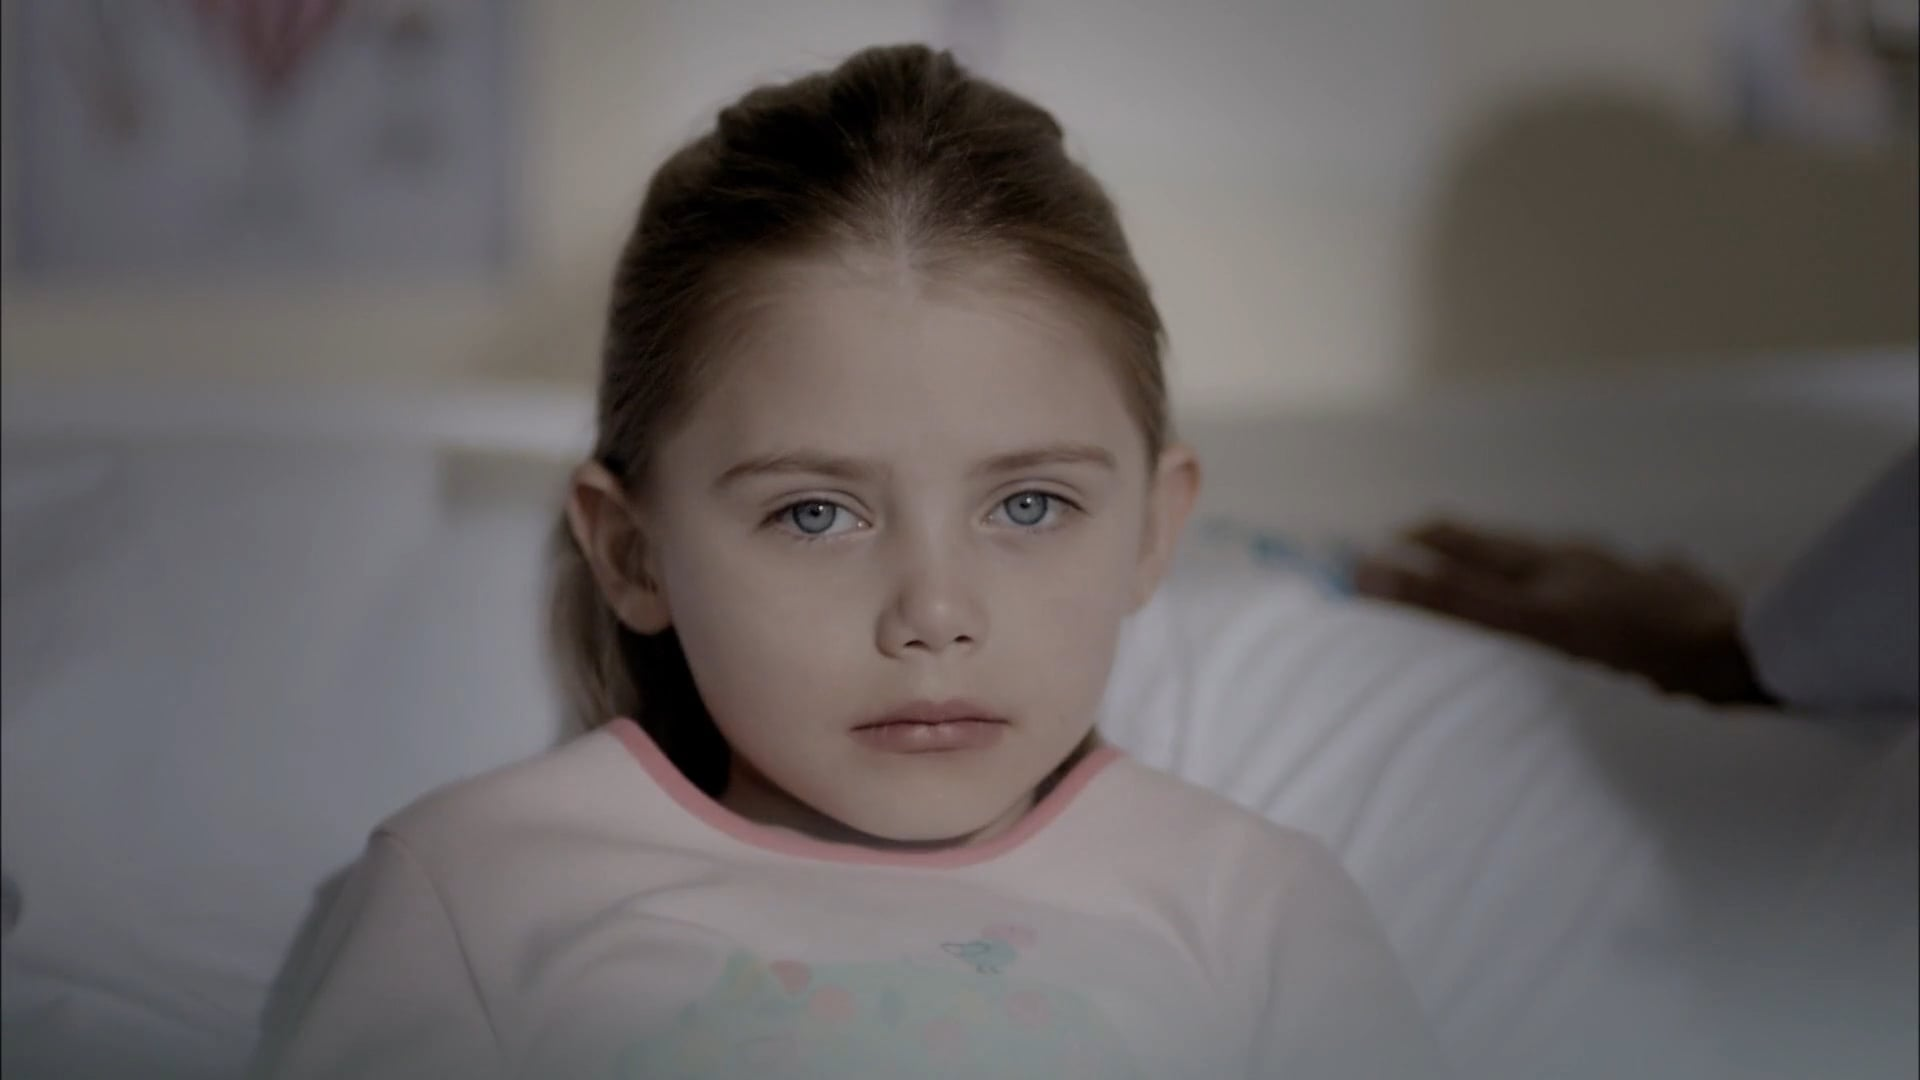 Selcen Ergun - Lösev (Director's cut)